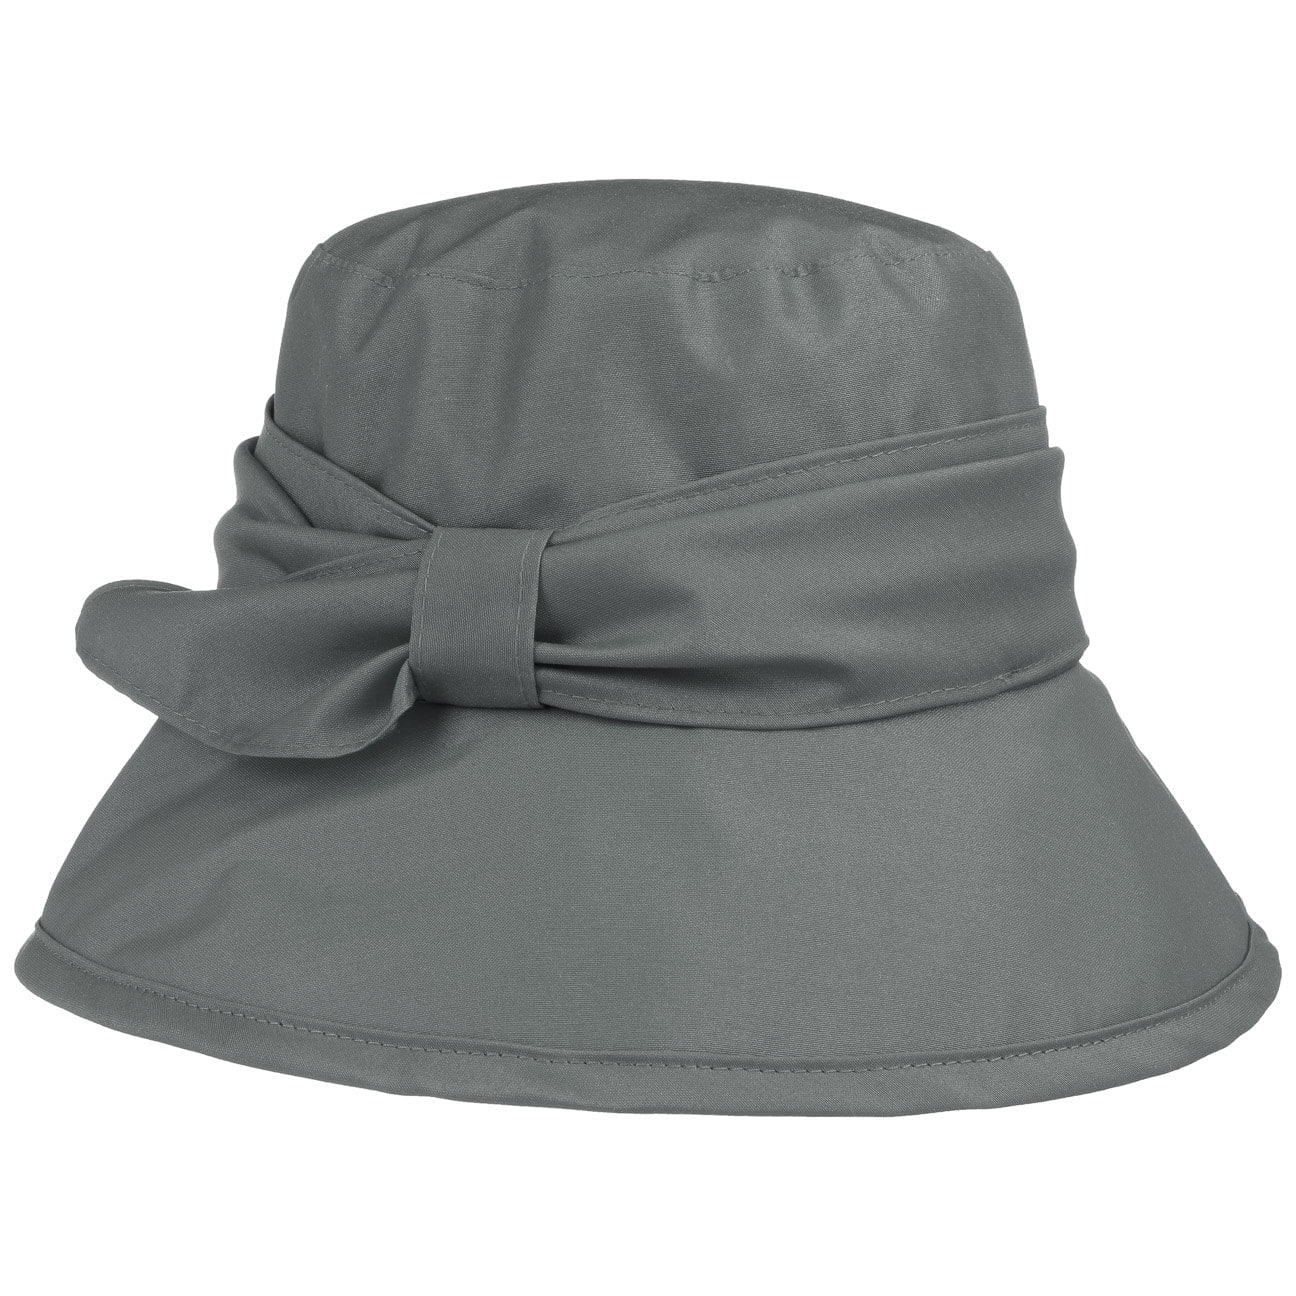 Sombrero de Lluvia Bessa by Bront?  sombrero de lluvia